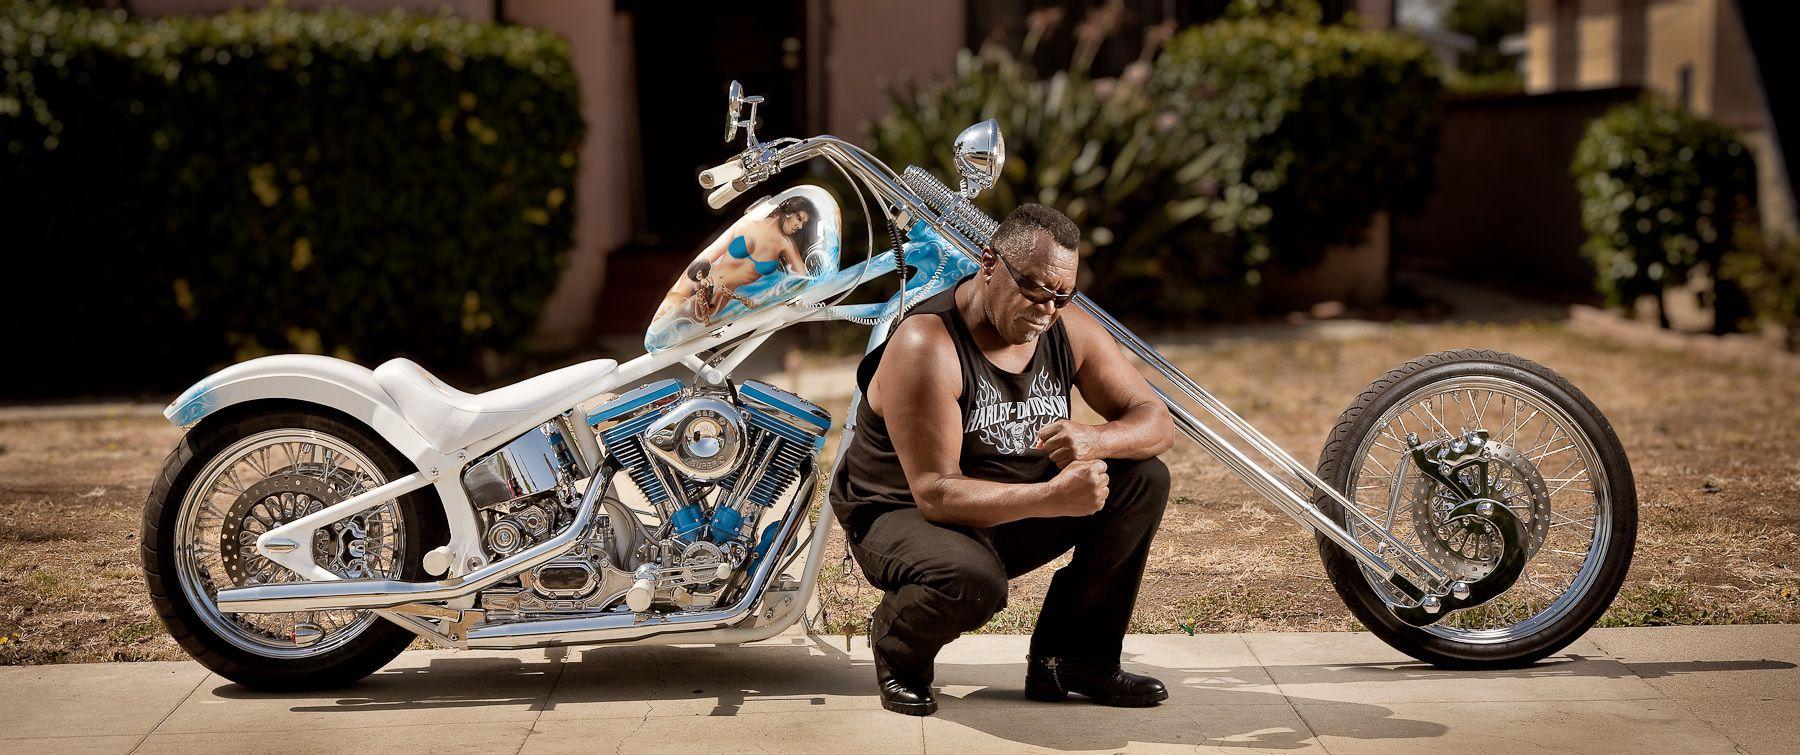 Mr. Chop & his new bike